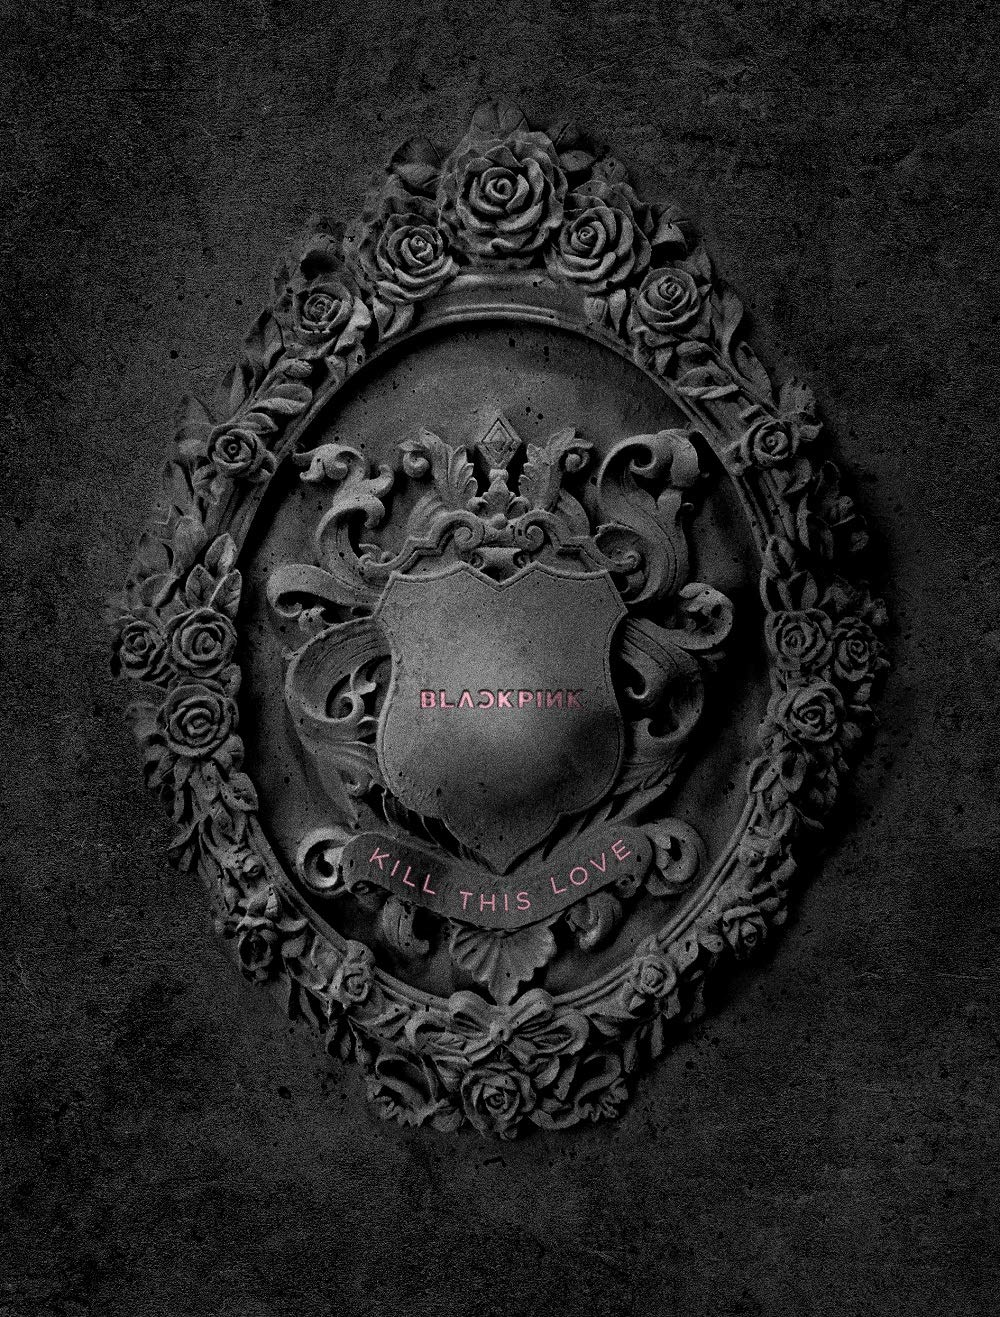 YG Blackpink - Kill This Love [Black ver.] (2nd Mini Album) CD+52p Photobook+Lyrics Book+4Photocards+Polaroid Photocard+Sticker Set+On Pack Poster+Folded Poster+Double Side Extra Photocards Set by YG